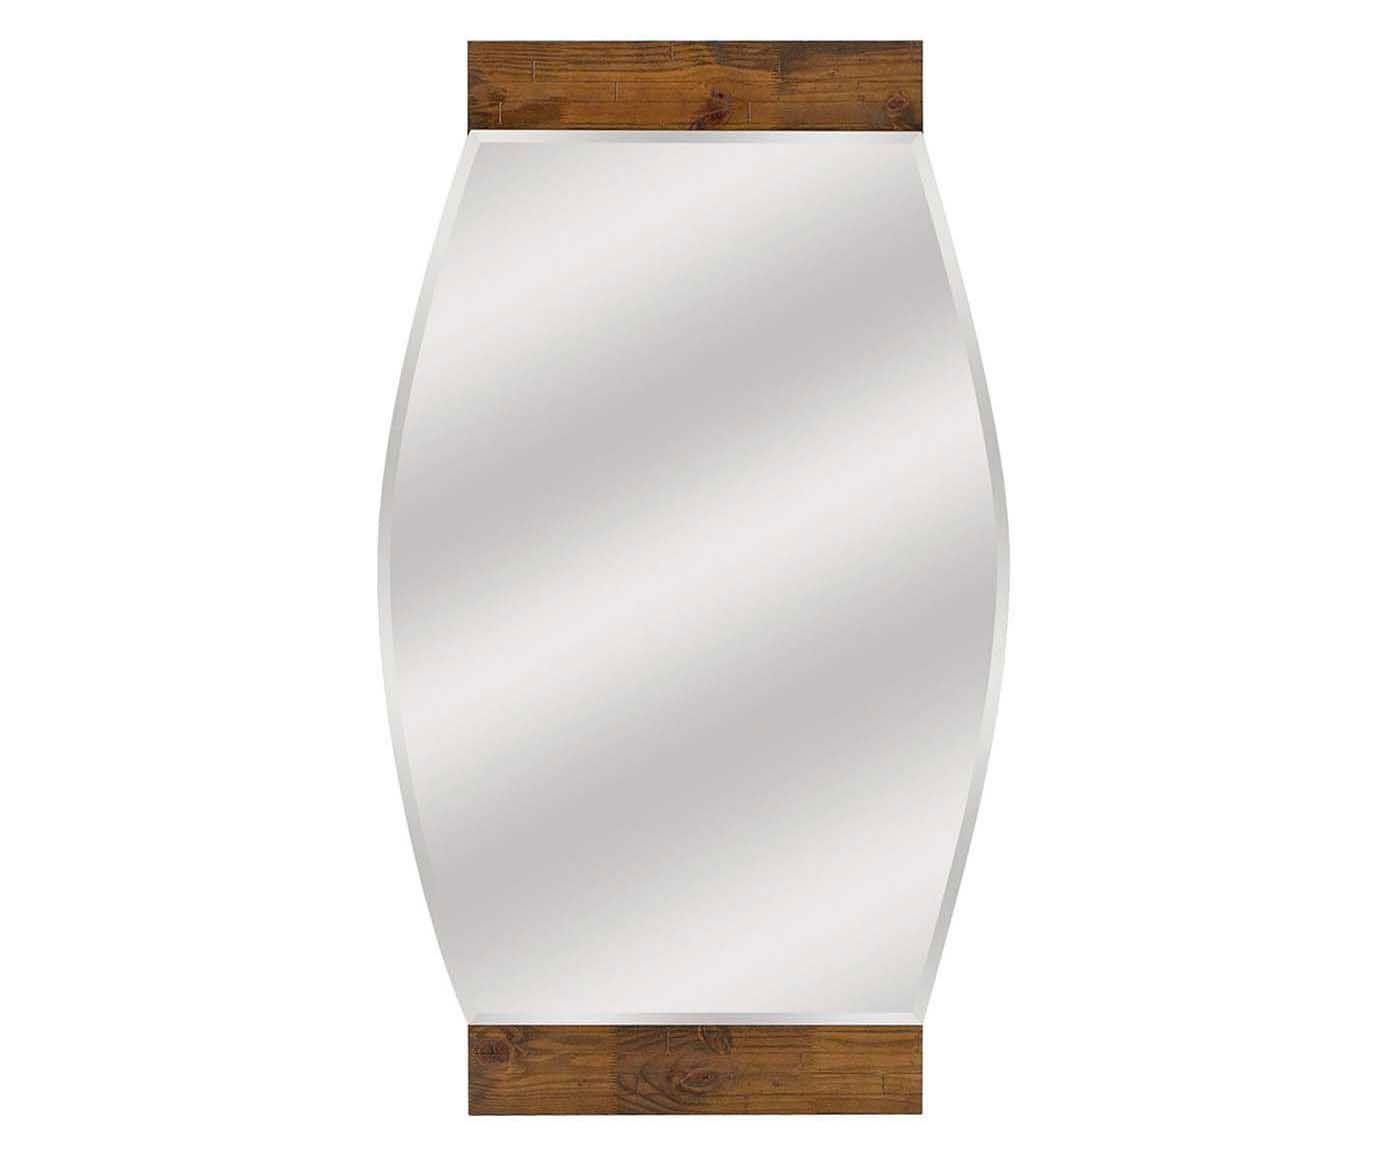 Espelho art glorific - 70x120cm   Westwing.com.br